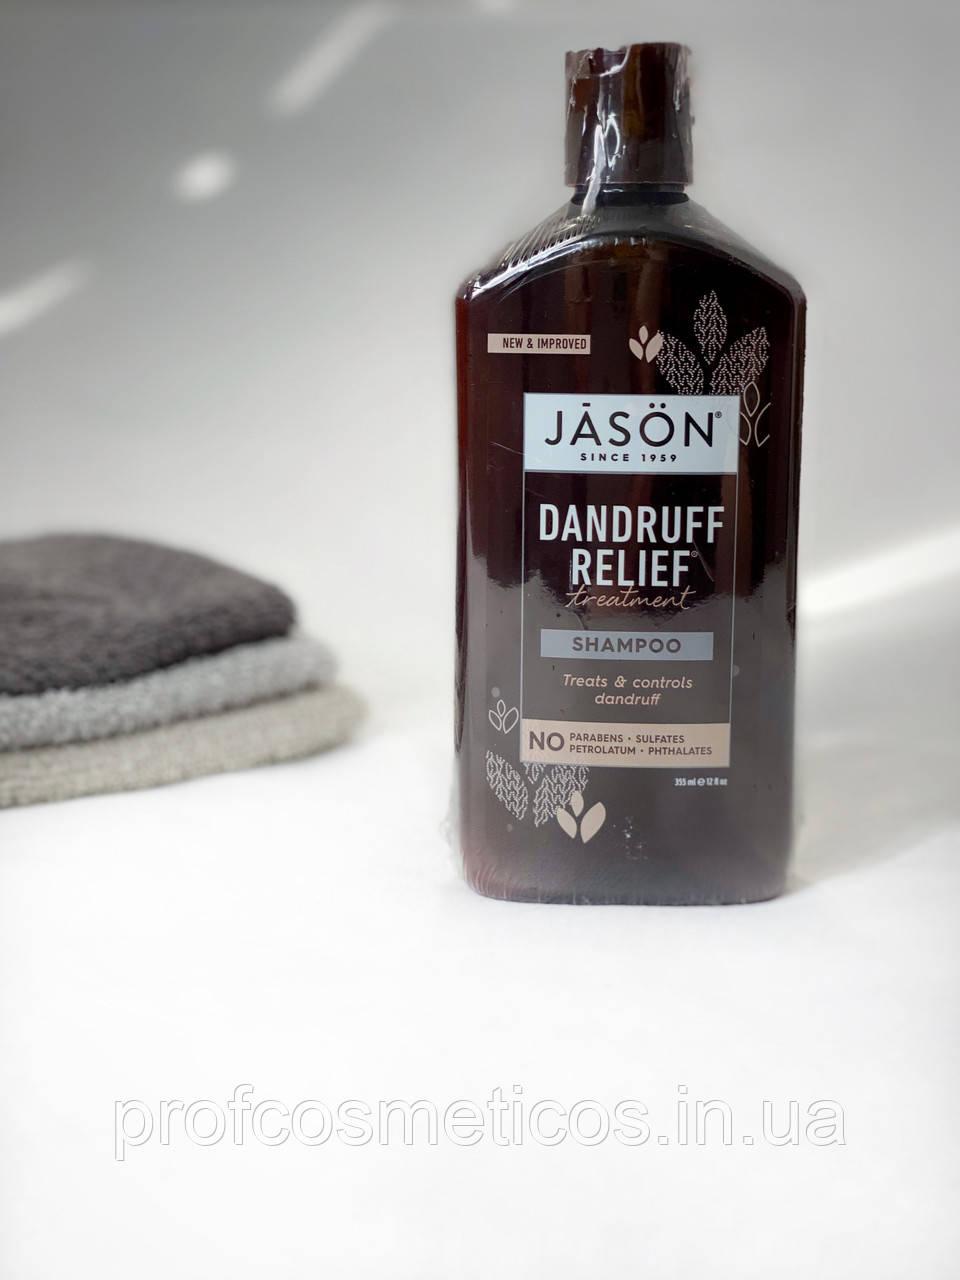 Jason Natural, Лікувально - профілактичний шампунь Dandruff Relief, 355 мл